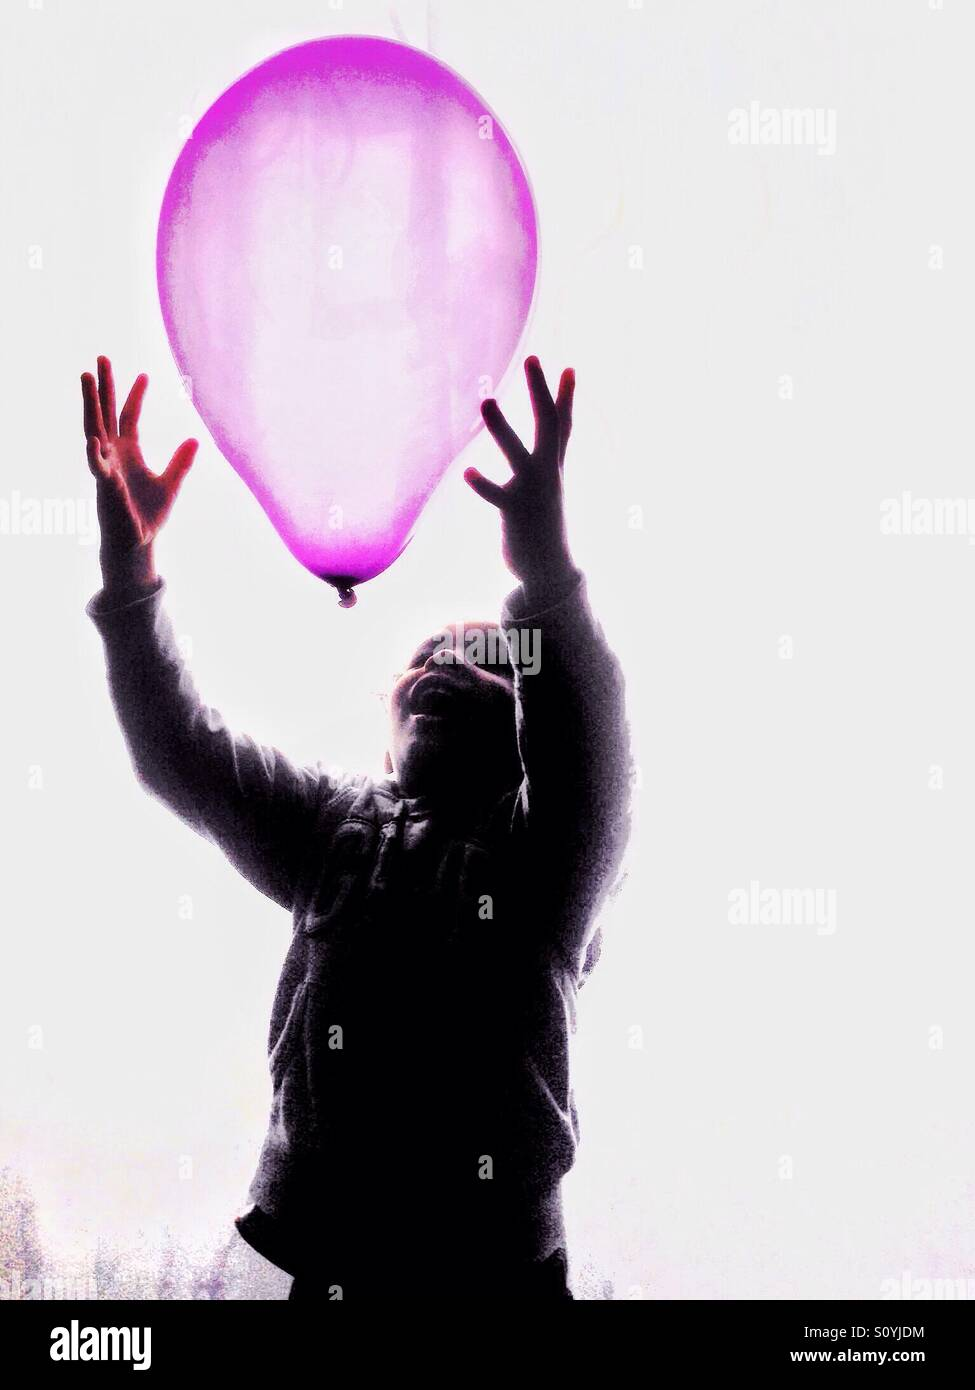 Garçon attraper un ballon rose.Banque D'Images